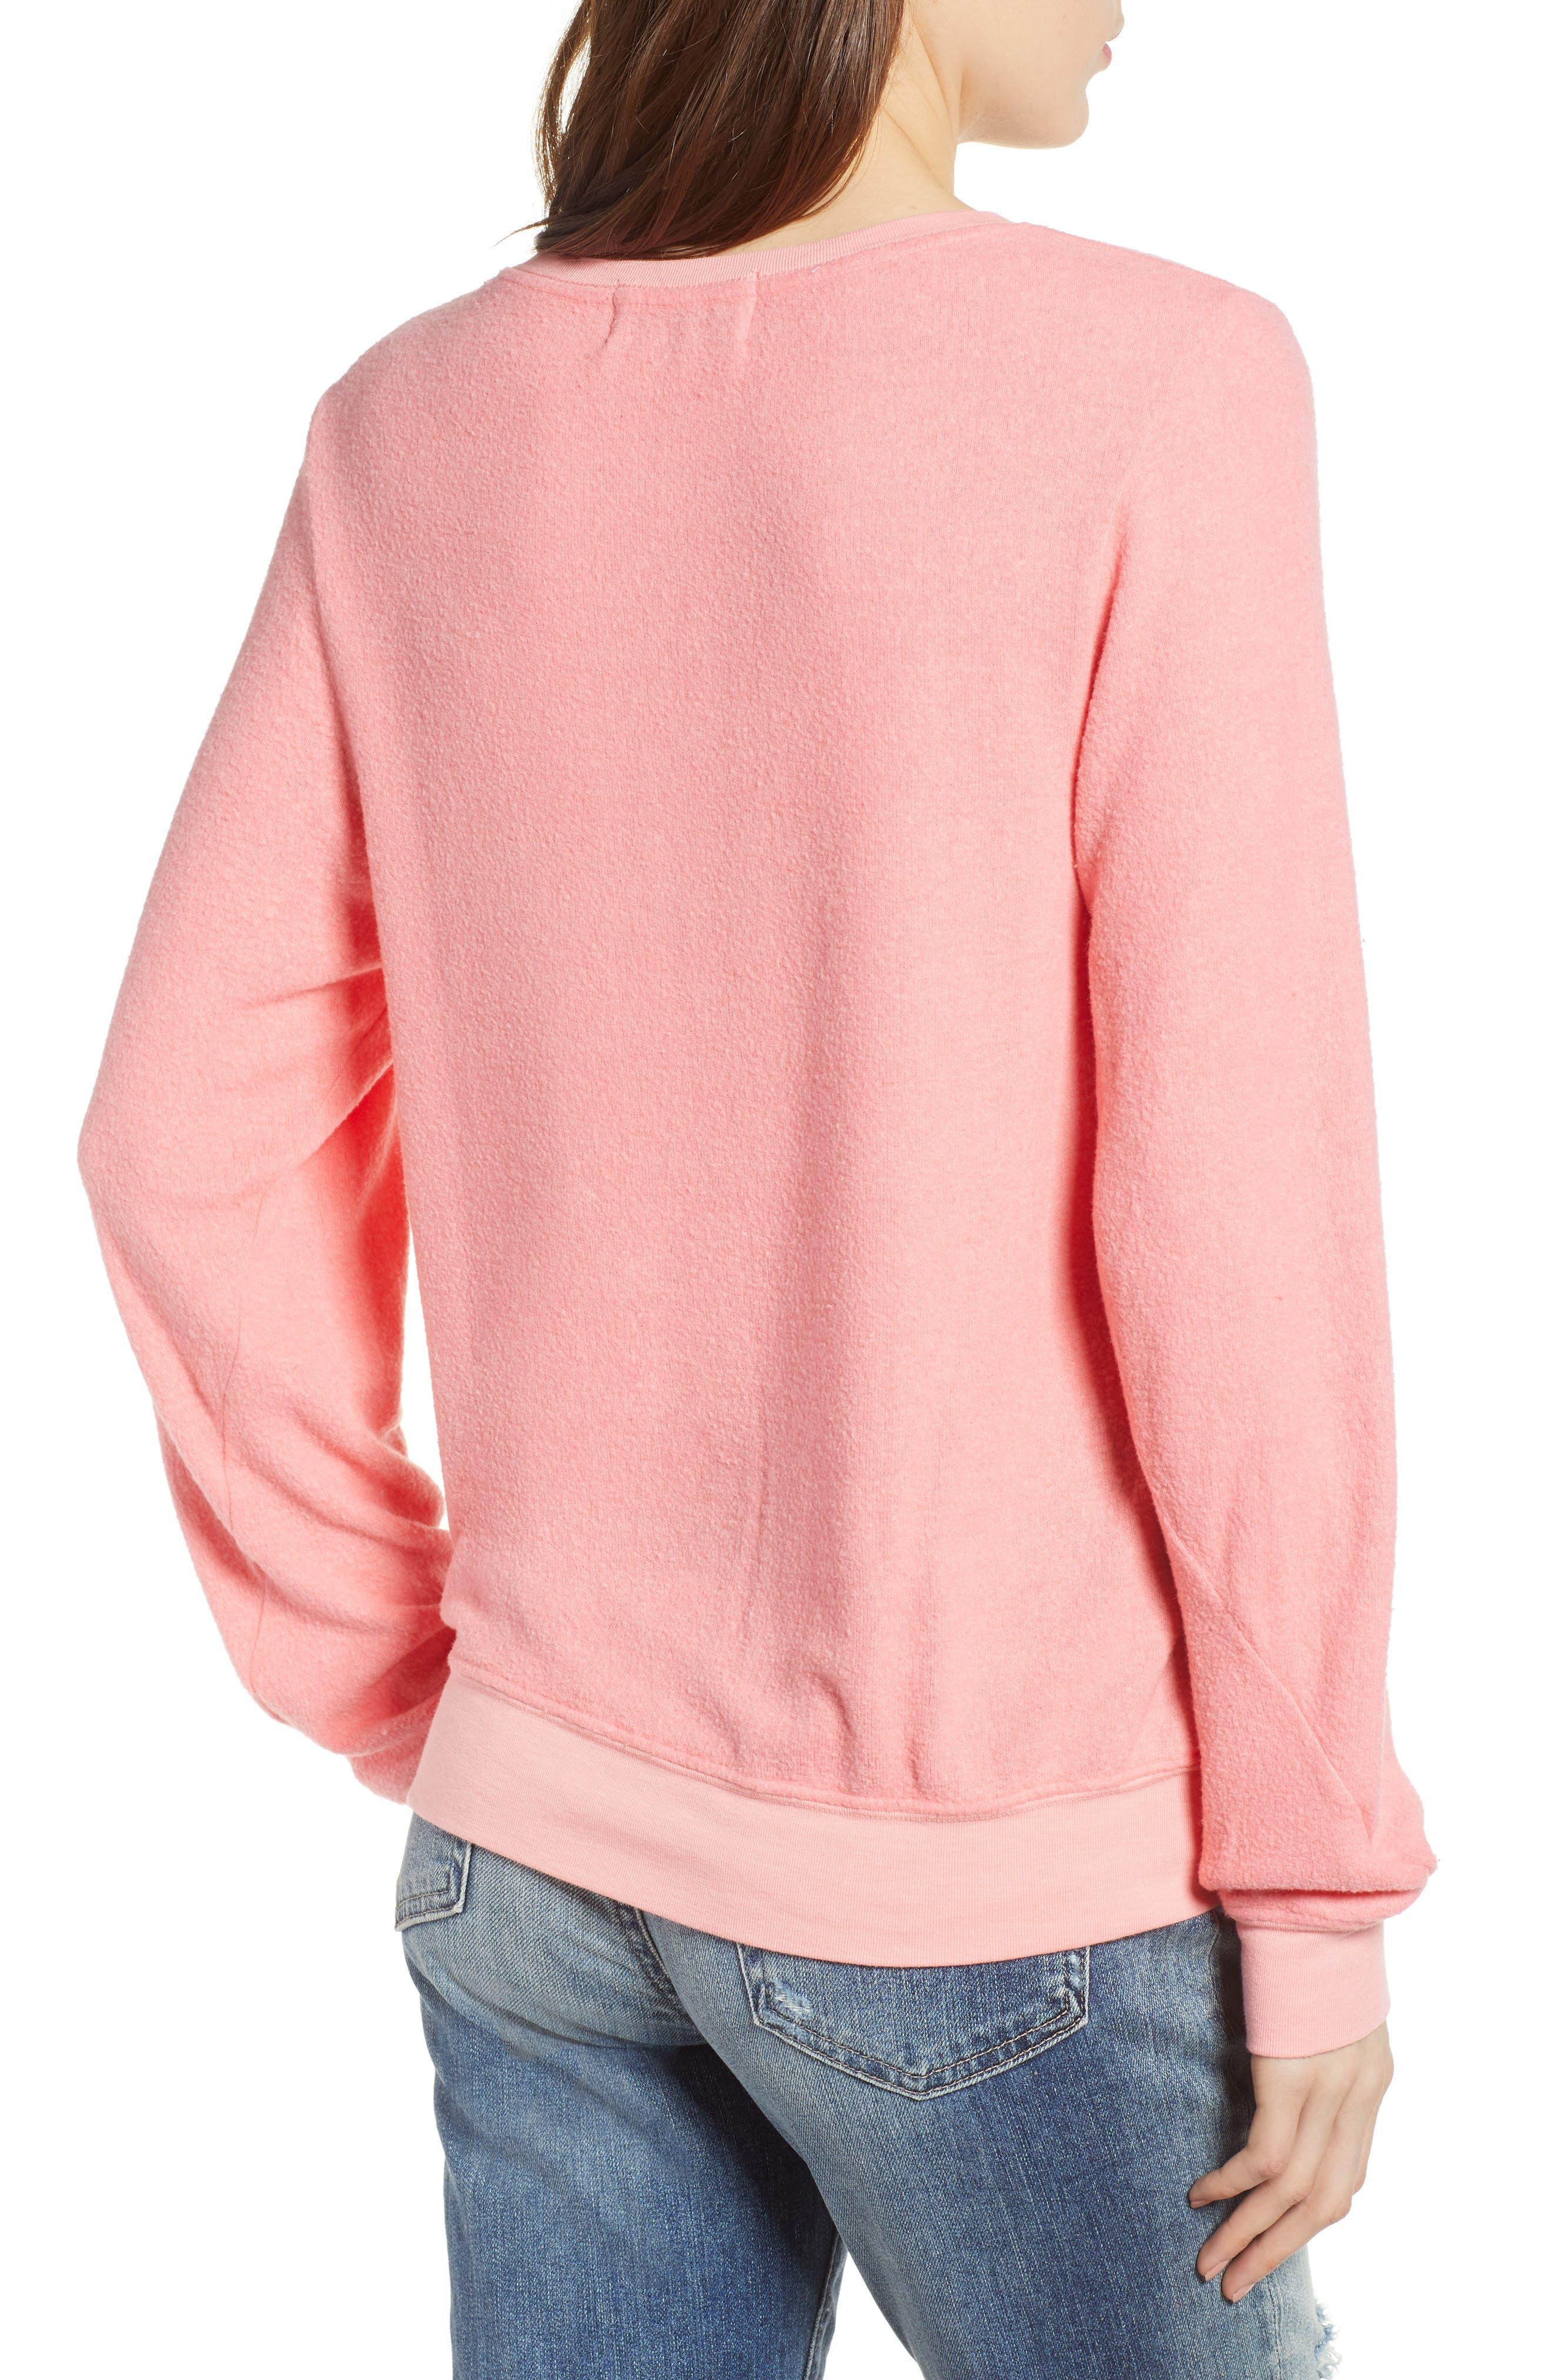 Pardon My French Sweatshirt,                             Alternate thumbnail 2, color,                             950